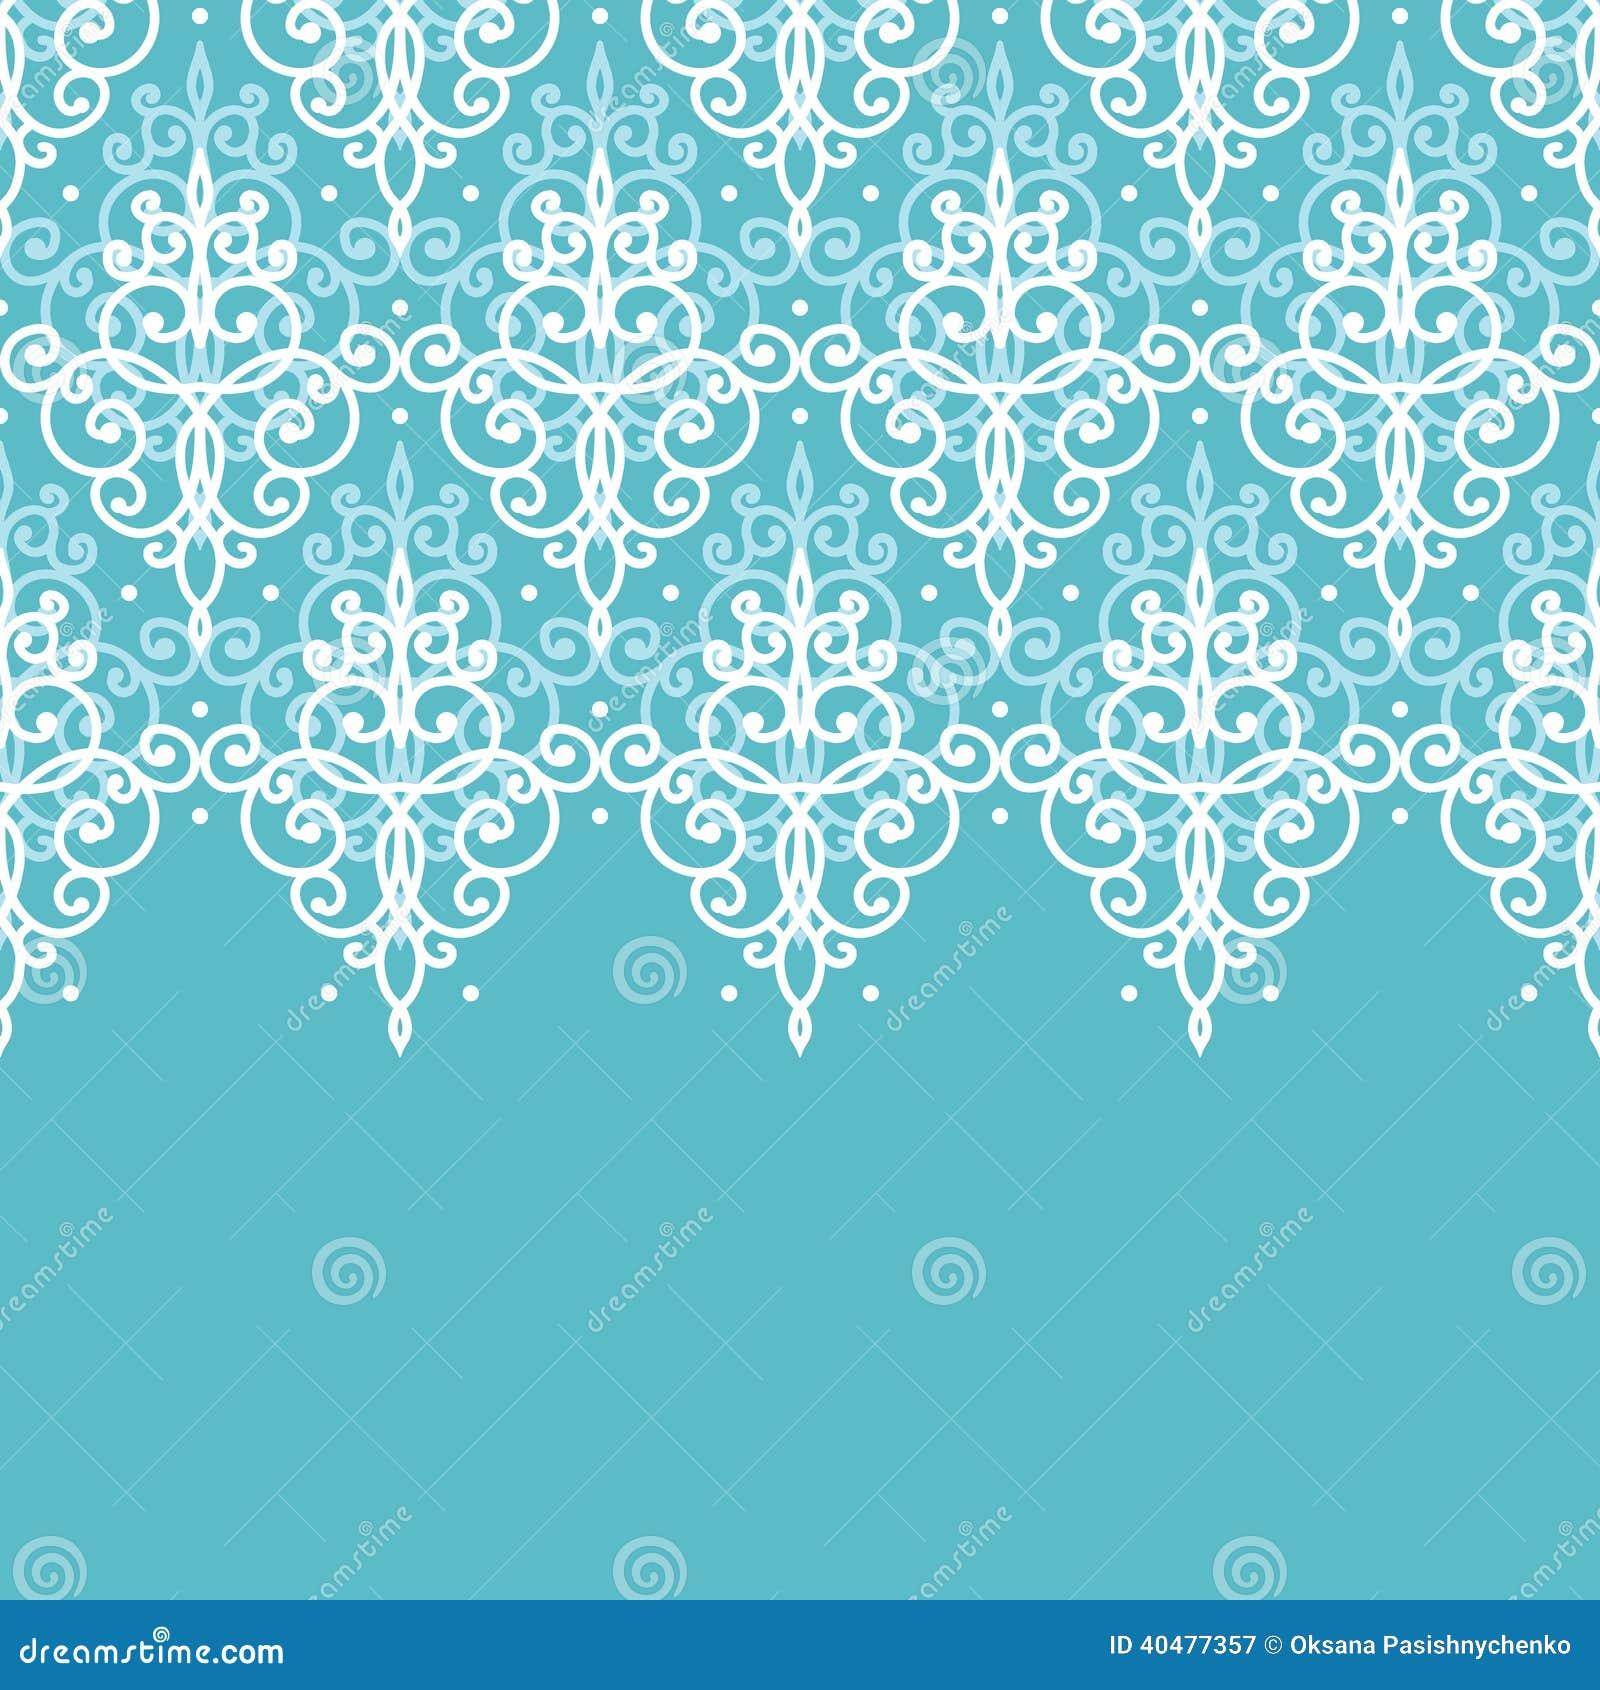 swirling royal pattern wallpaper - photo #16